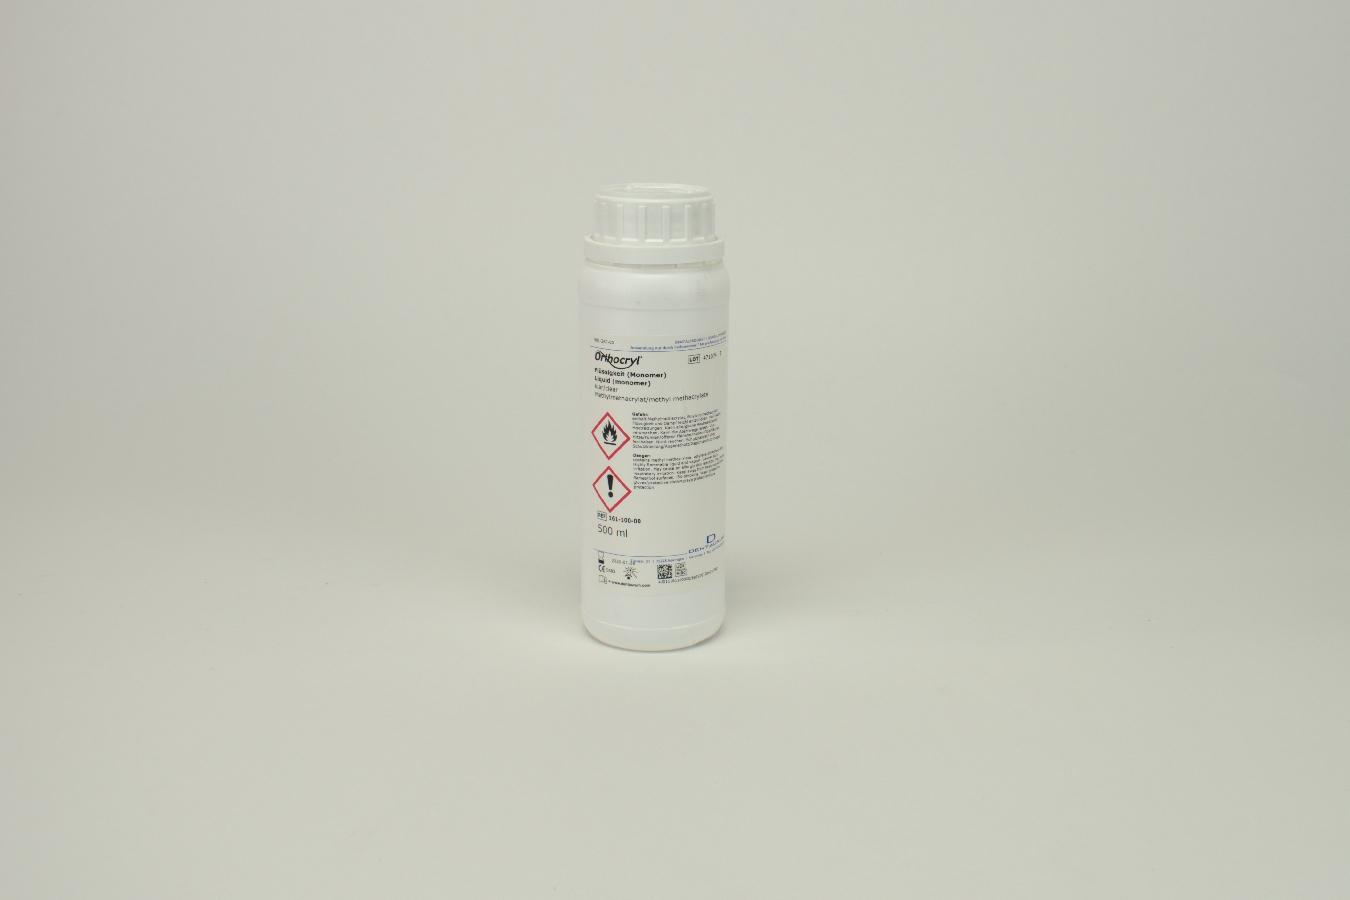 Orthocryl Flüssig klar 500ml